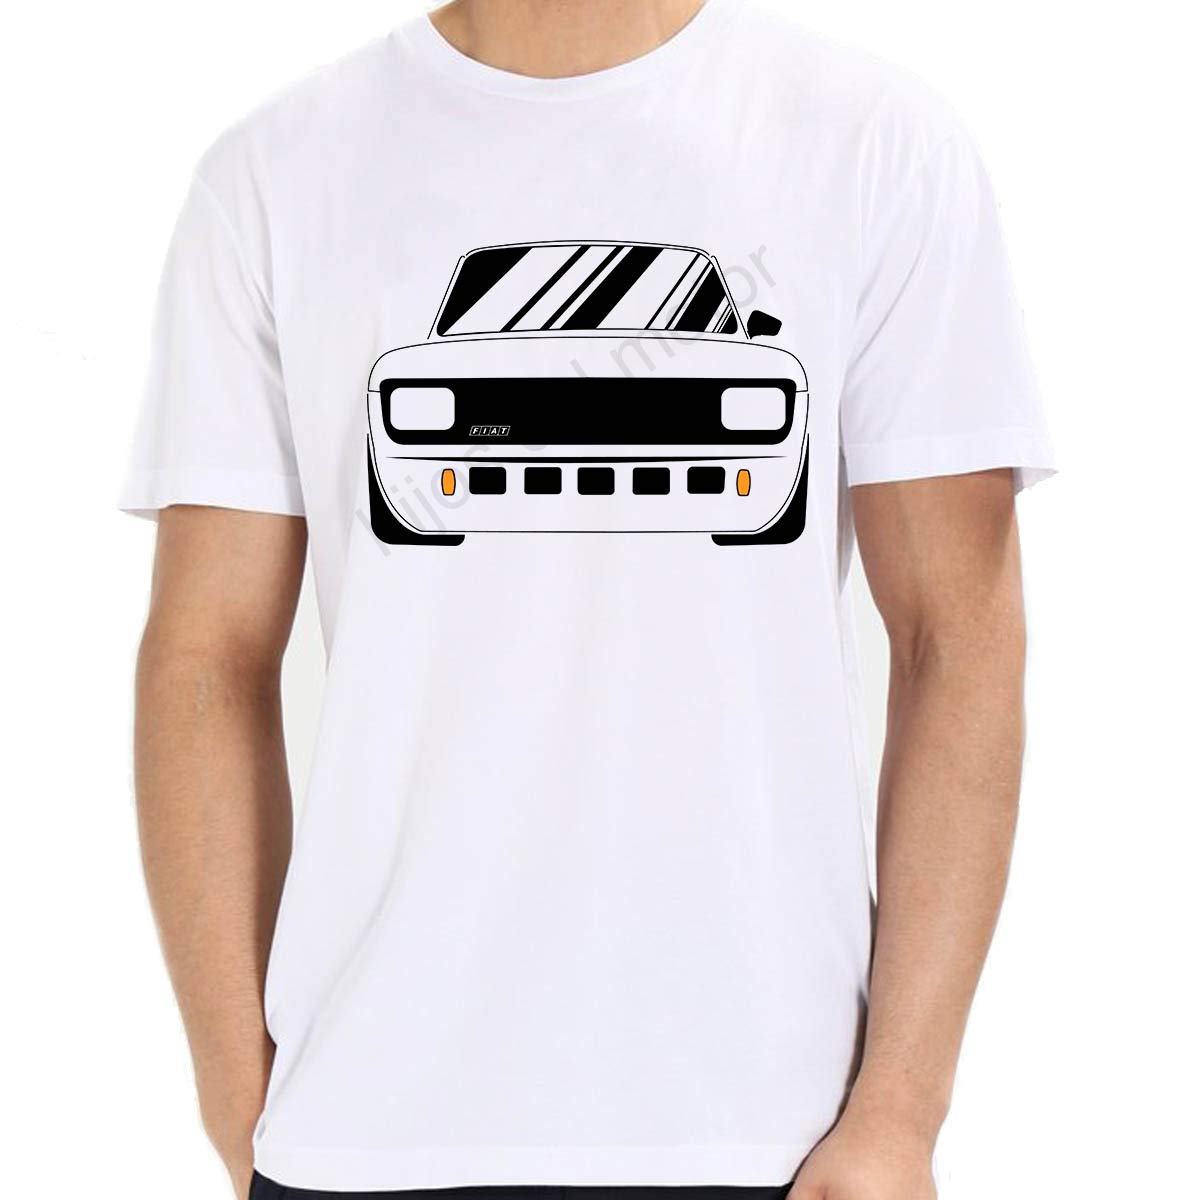 Desconocido Camiseta fiat 127 mk2